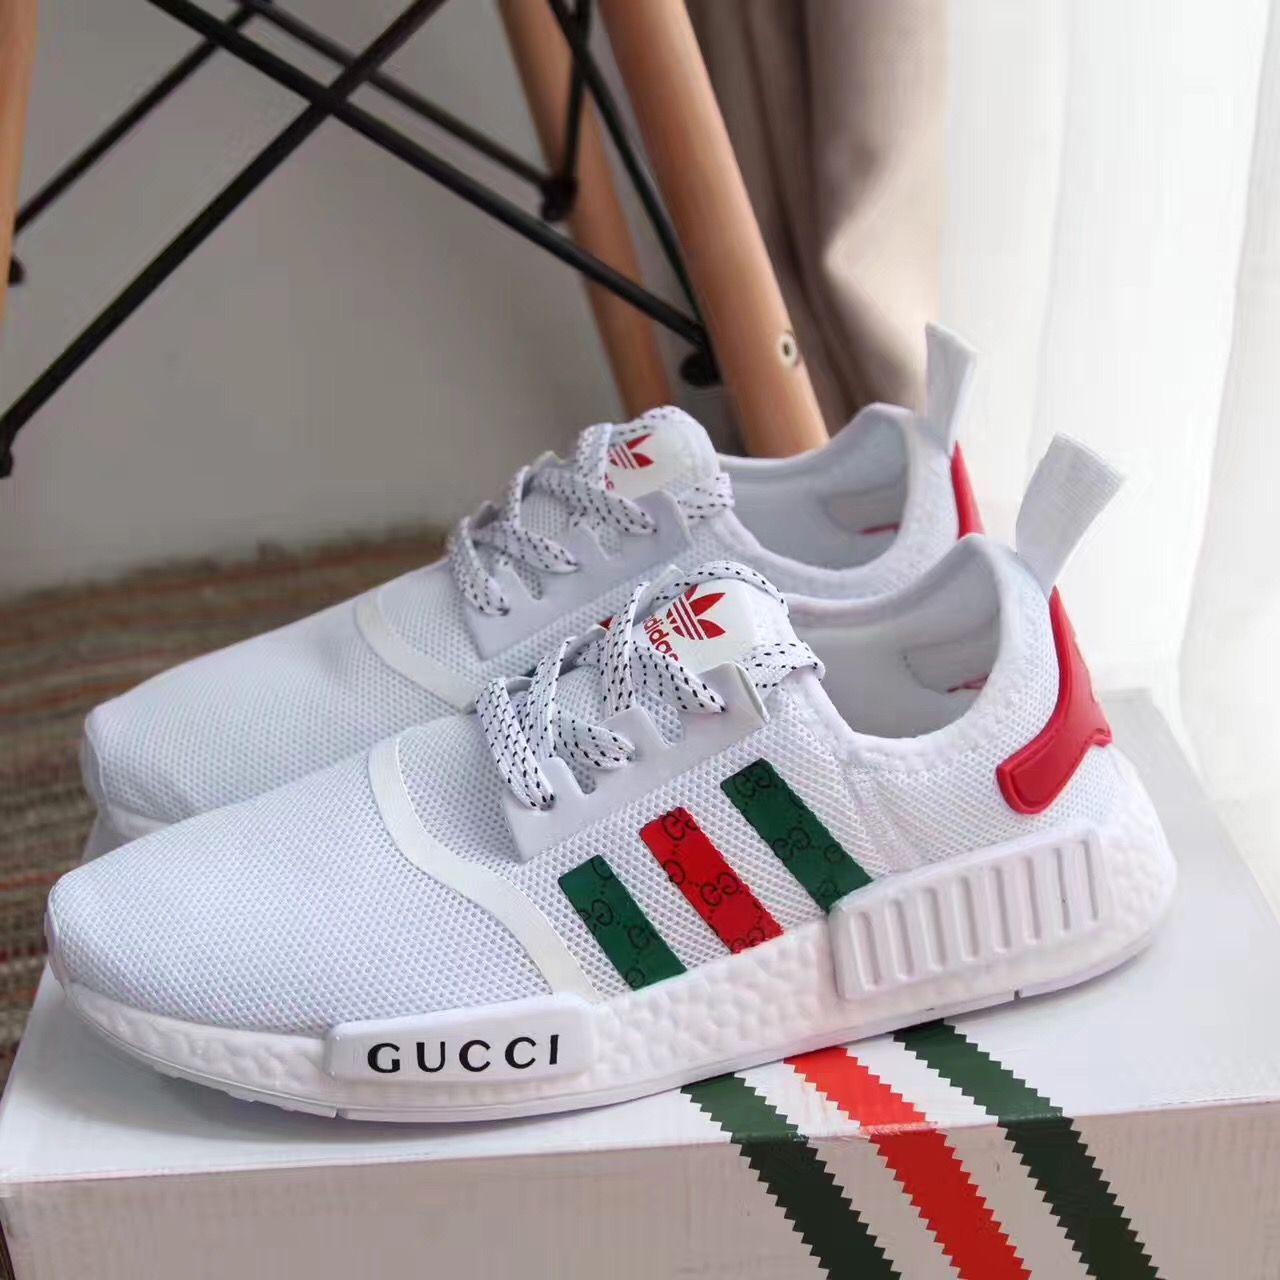 Adidas Gucci Woman Man Unisex Sport Sneakers Shoes Sneakers Fashion Gucci Outfits Sneakers Men Fashion